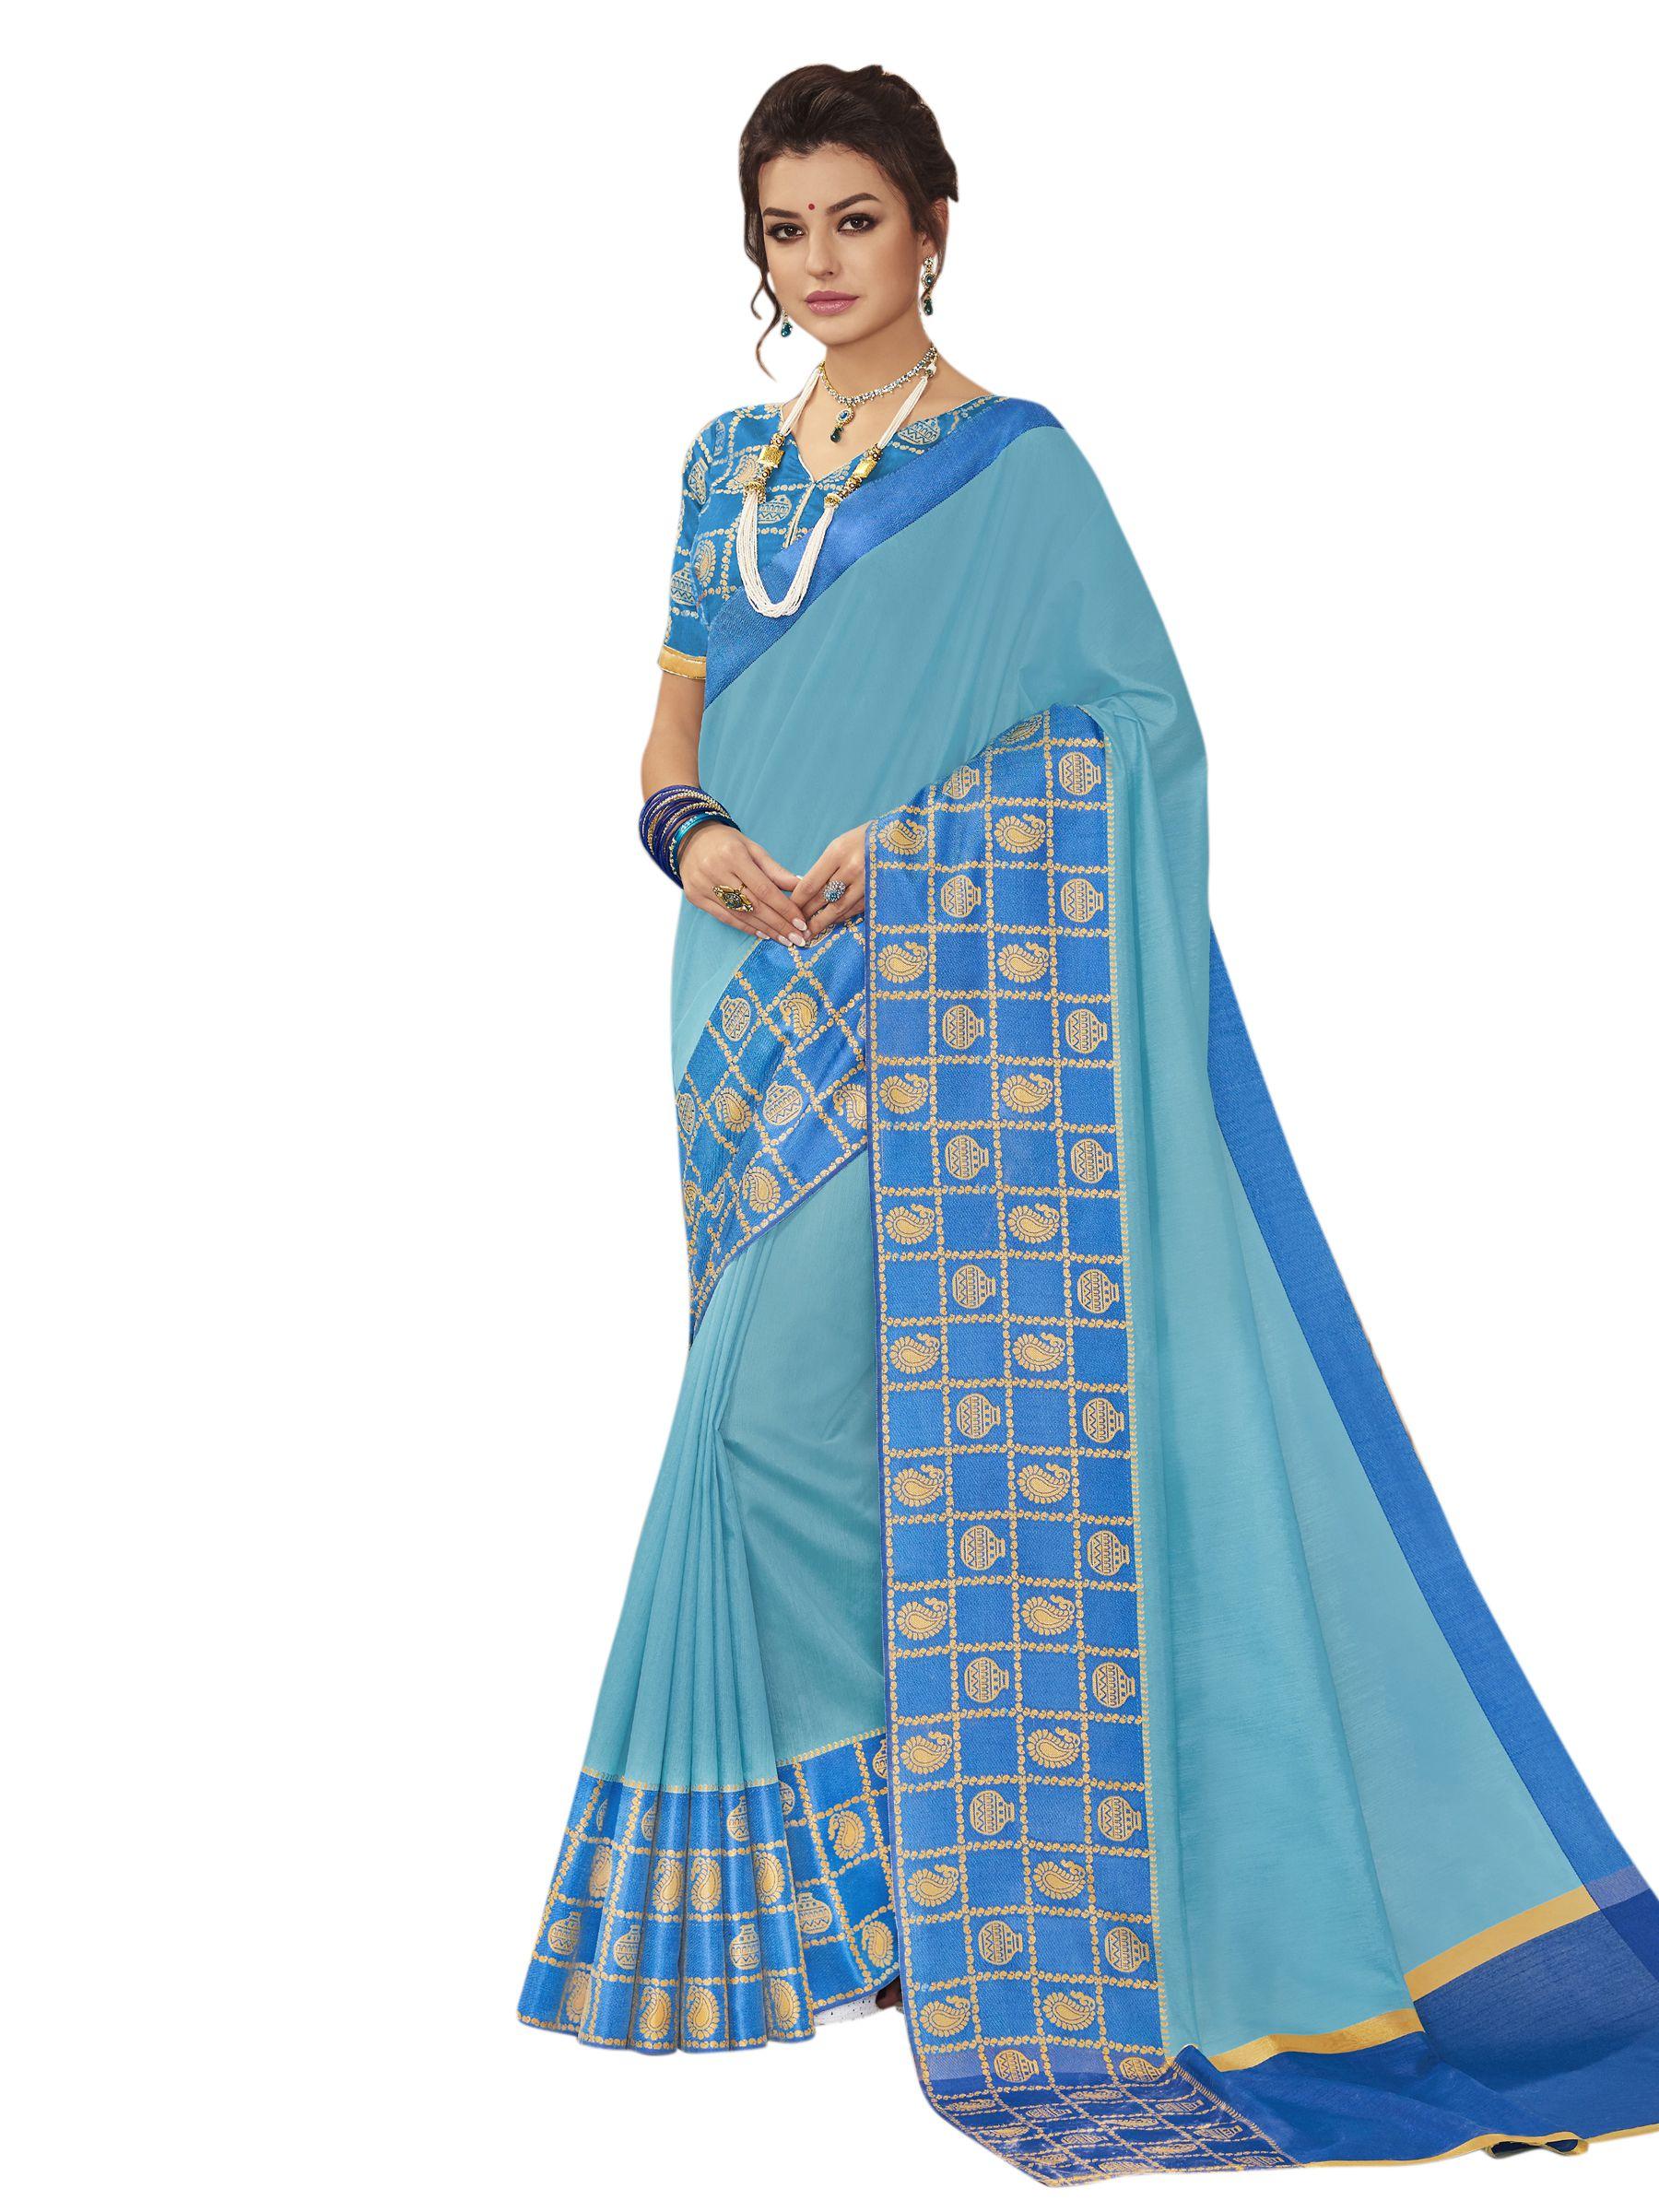 b6b8b65300 Stylee Lifestyle Green and Blue Banarasi Silk Saree - Buy Stylee Lifestyle  Green and Blue Banarasi Silk Saree Online at Low Price - Snapdeal.com